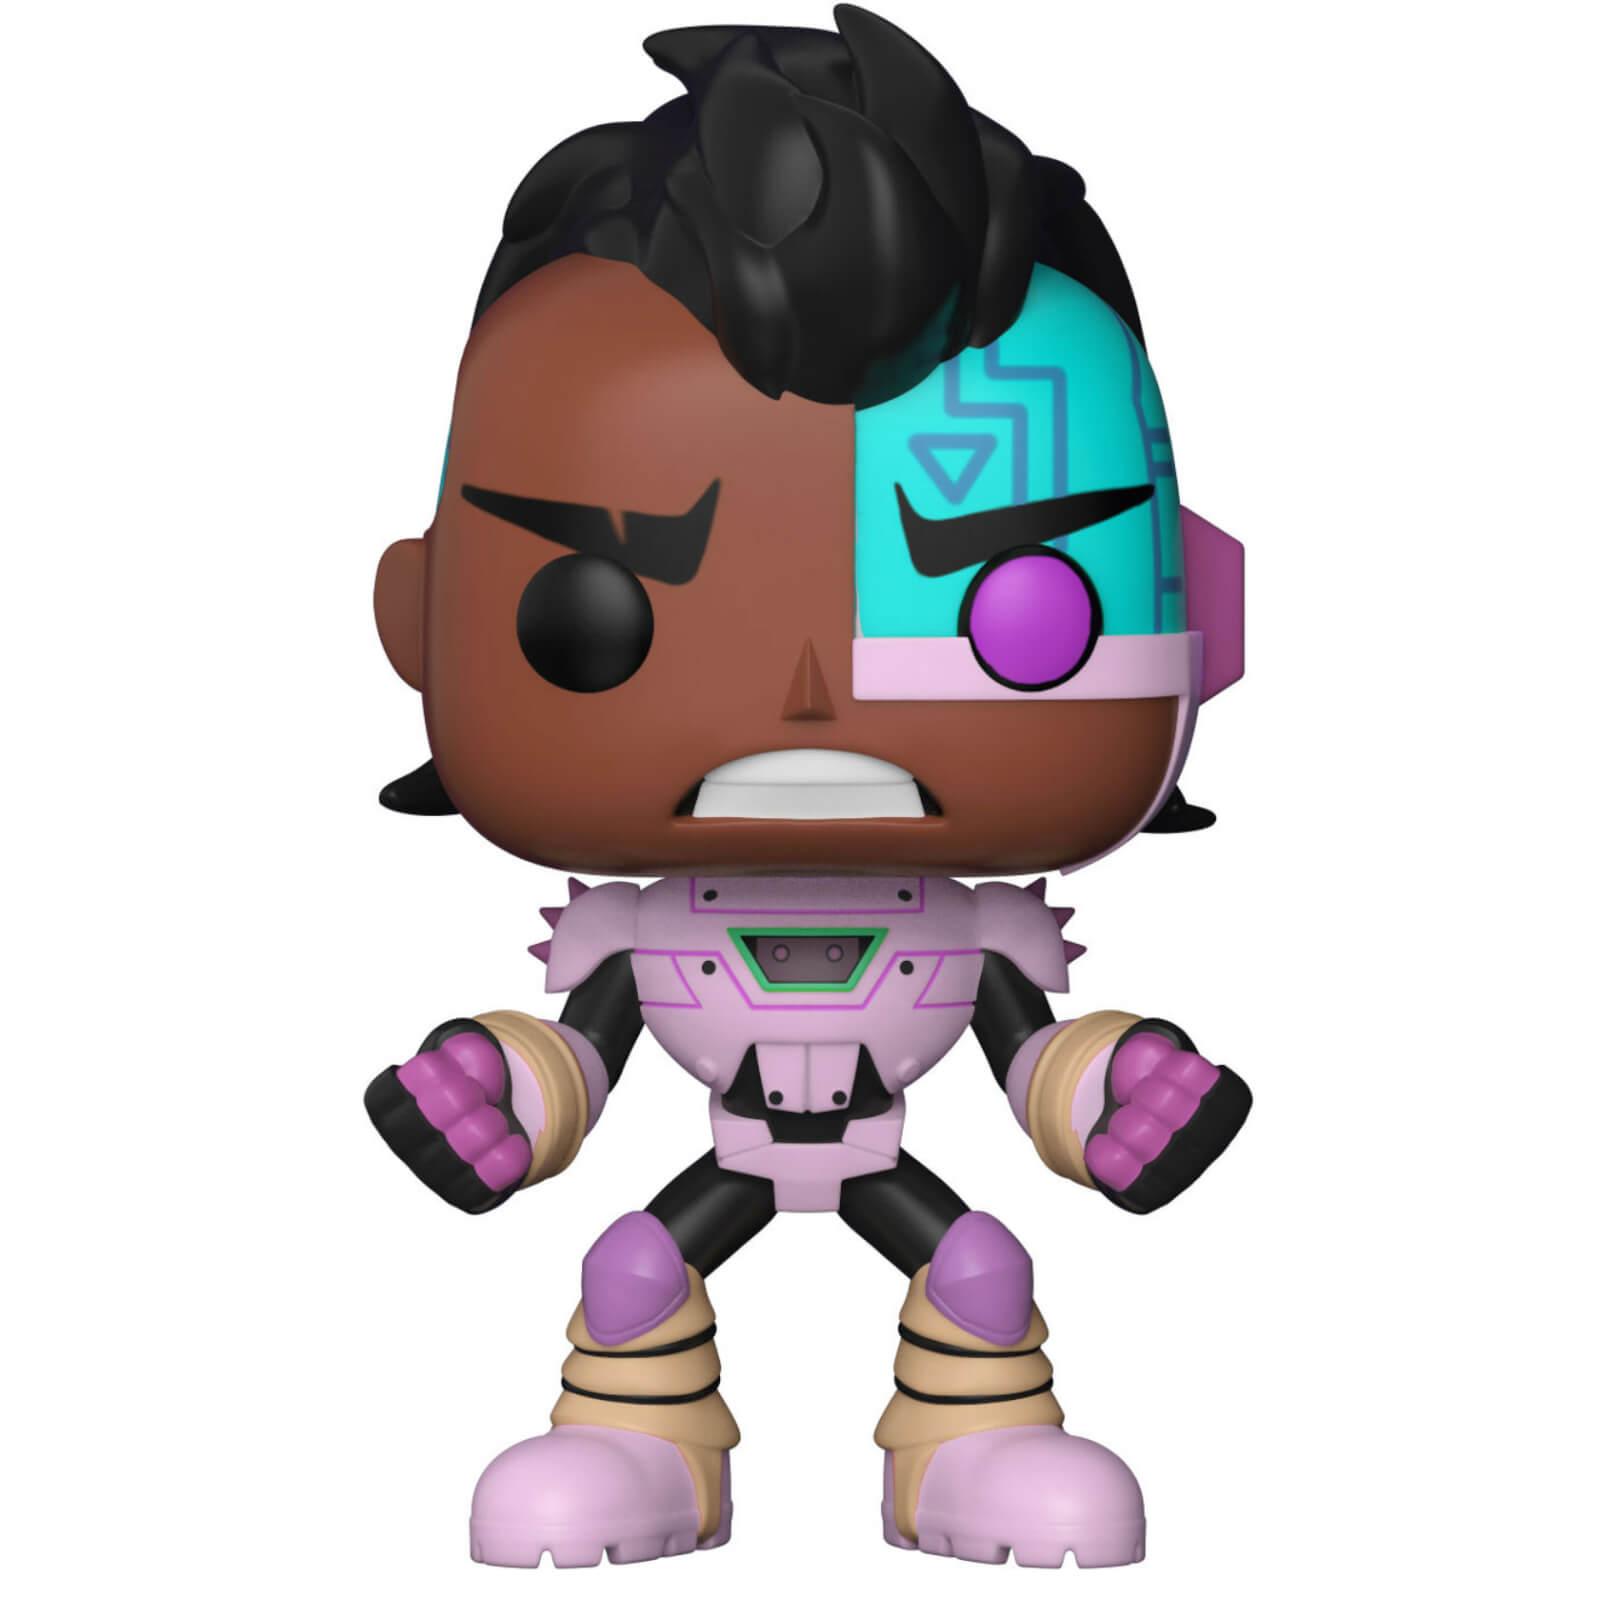 Funko POP! Vinyl Фигурка Teen Titans Go: the Night Begins To Shine: Cyborg фигурка teen titans go night begins to shine funko pop television cyborg 9 5 см